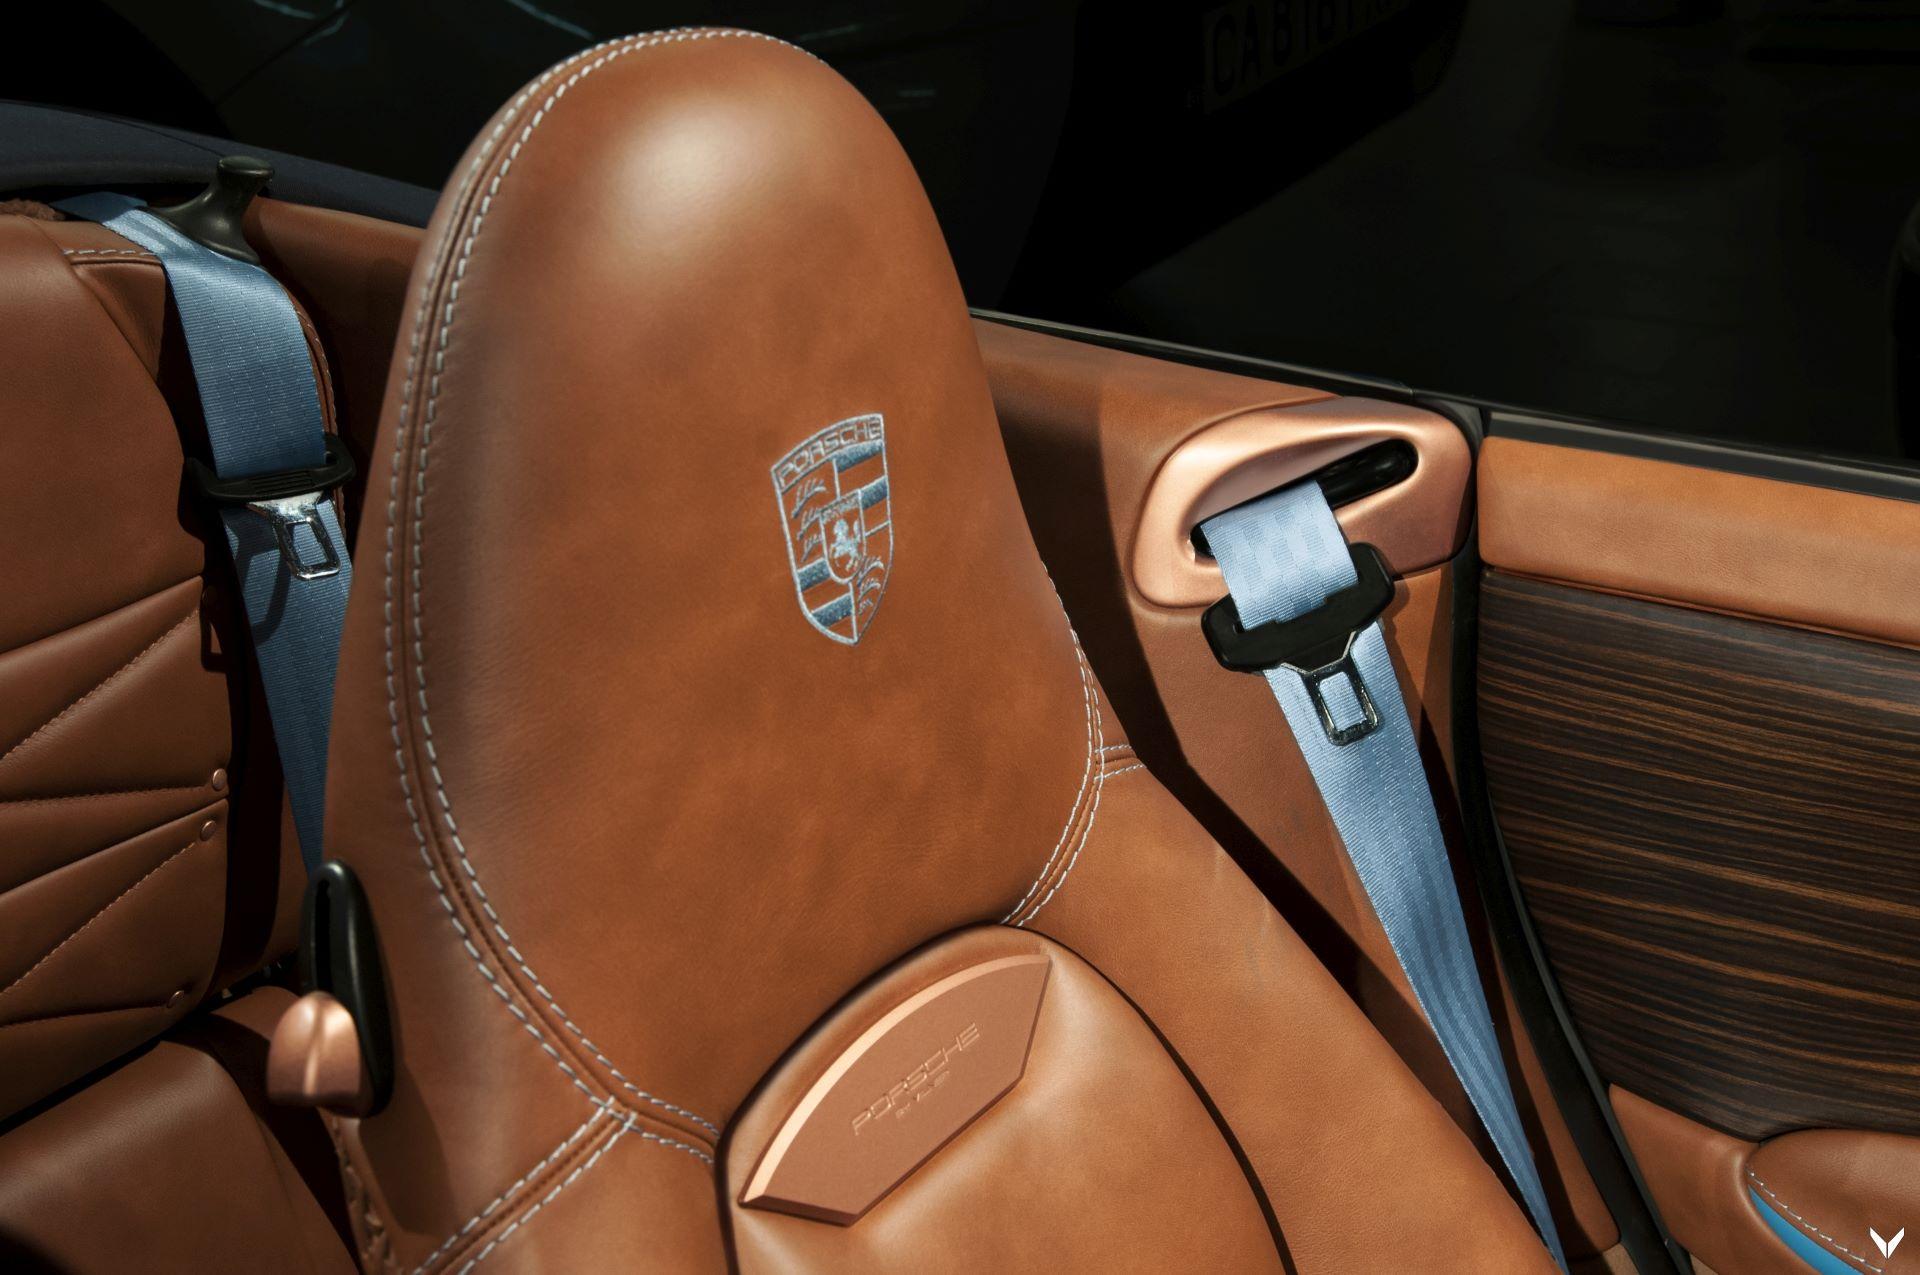 Porsche-911-Cabriolet-by-Vilner-29